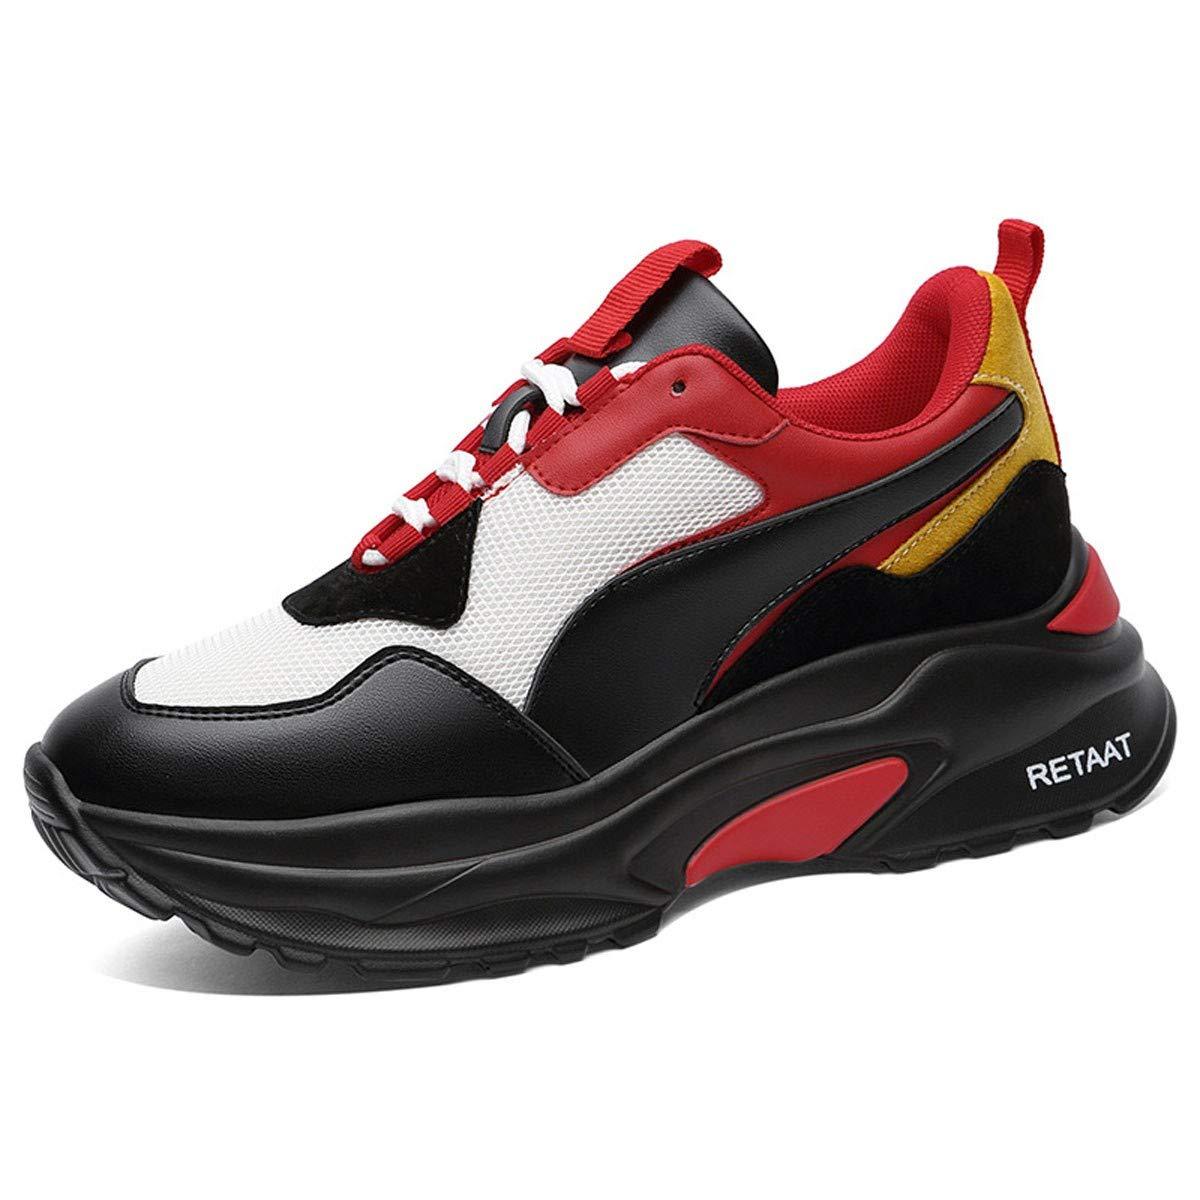 GTVERNH Frauen Schuhe/Freizeit Sport - Schuhe Frauen Schuhe Schuhe